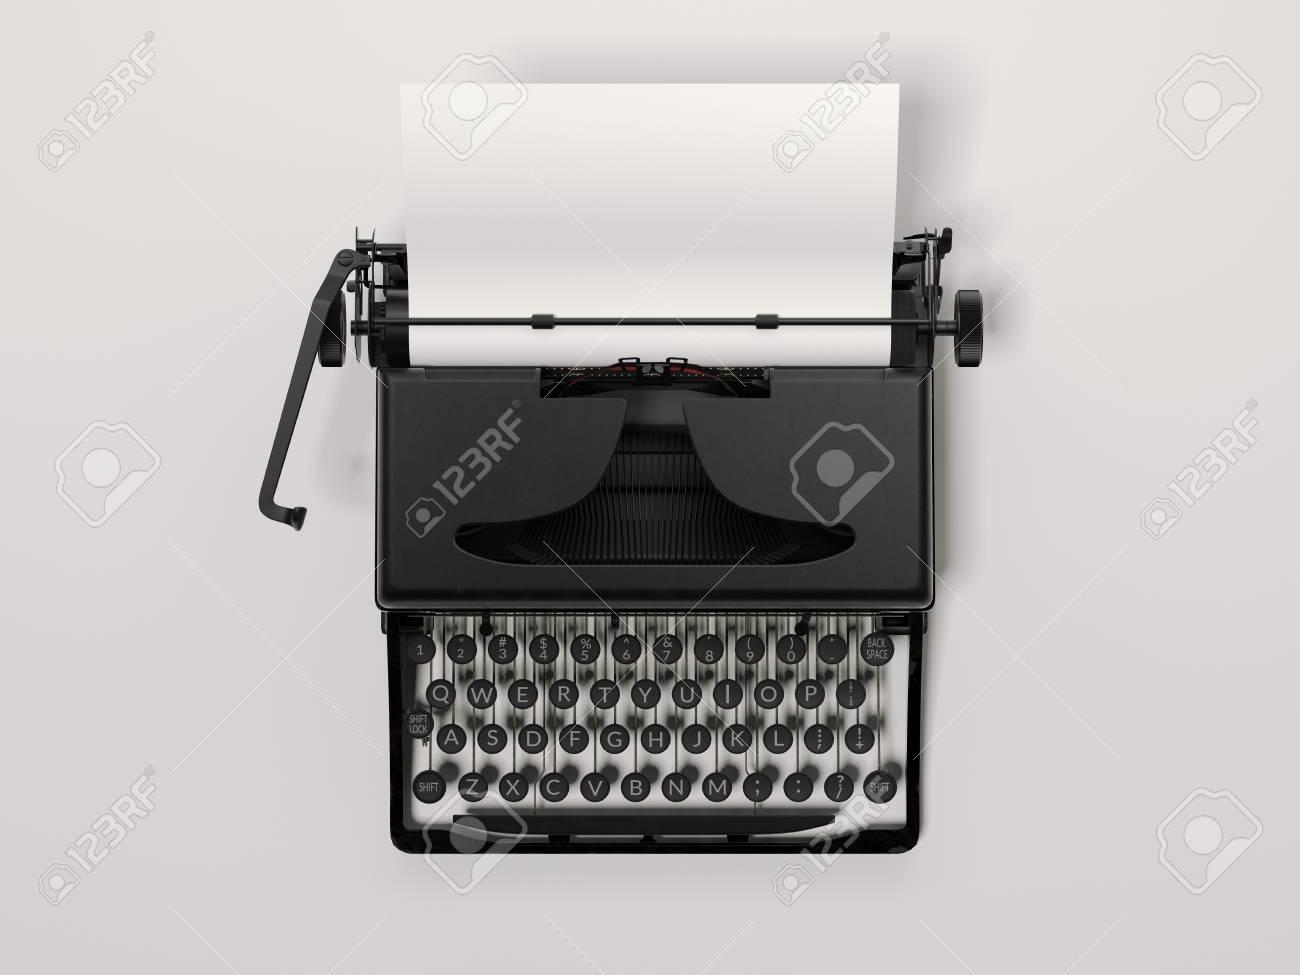 Black stylish typewriter with blank paper sheet. 3d rendering - 85946553